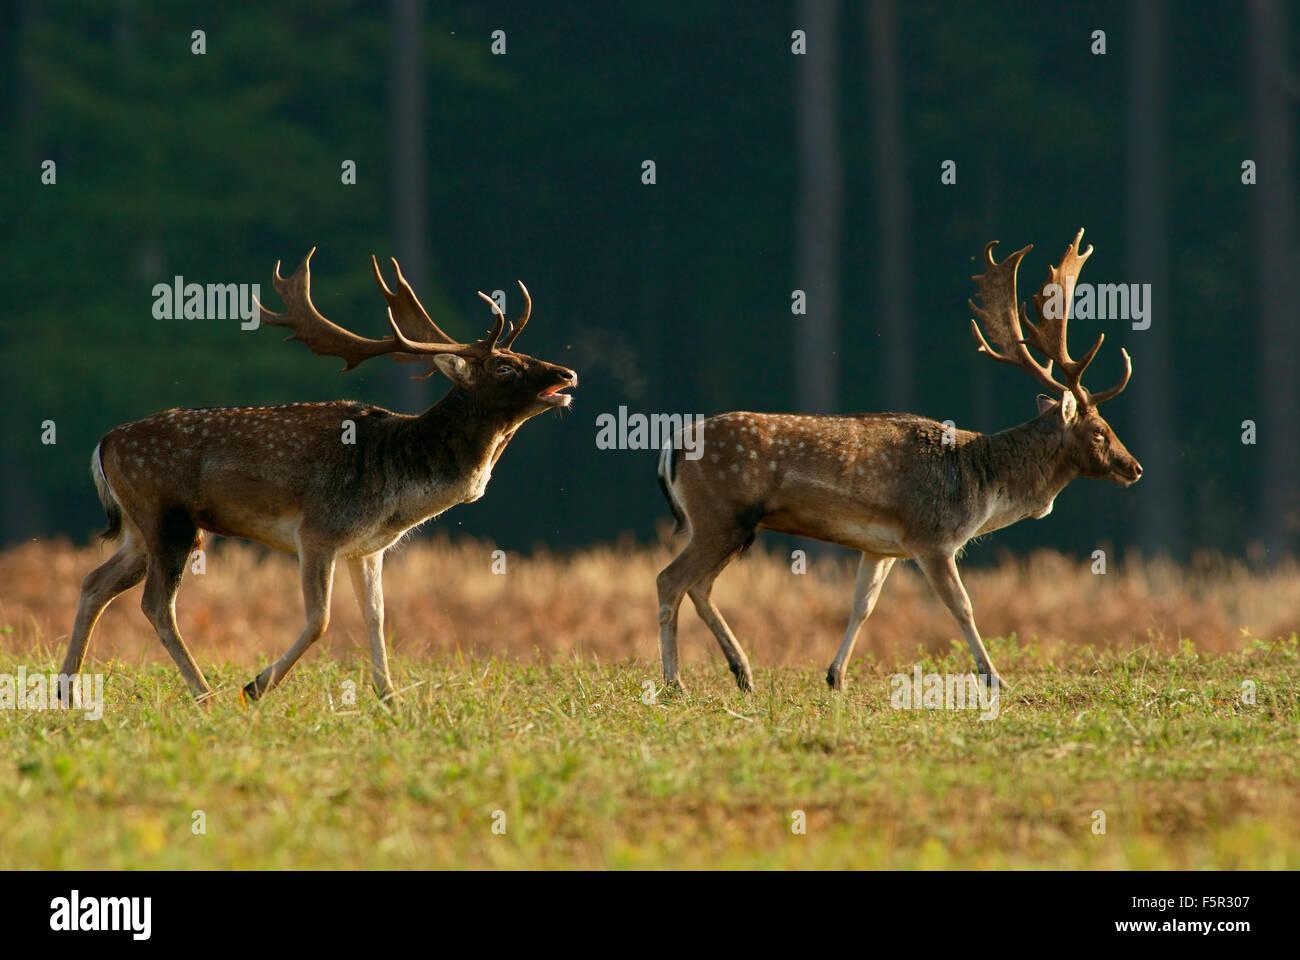 Fallow deer (Dama dama), bucks during the rut, Hesse, Germany - Stock Image